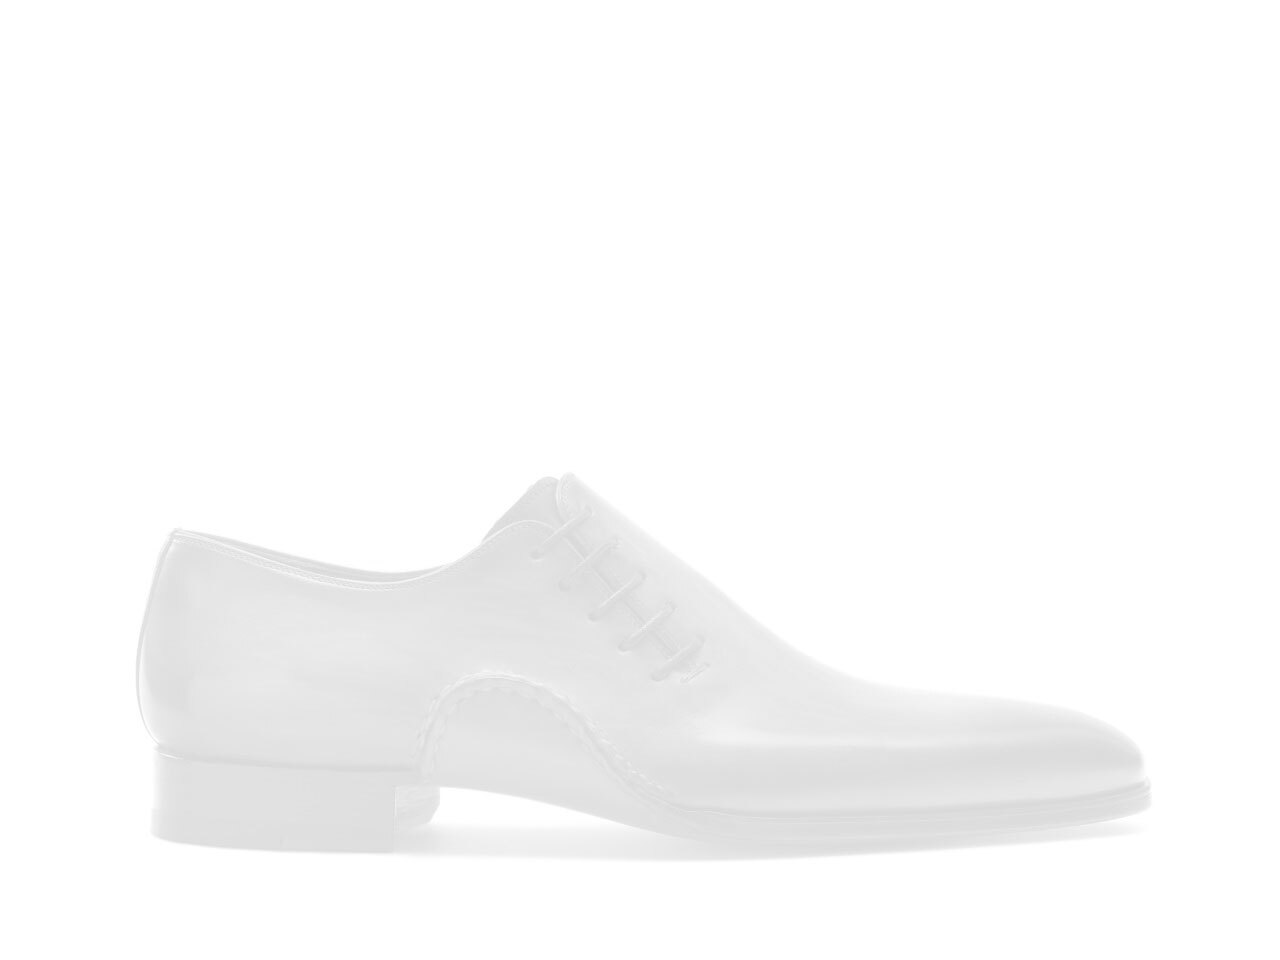 Sole of the Magnanni Kenton Grafito Men's Double Monk Strap Shoes